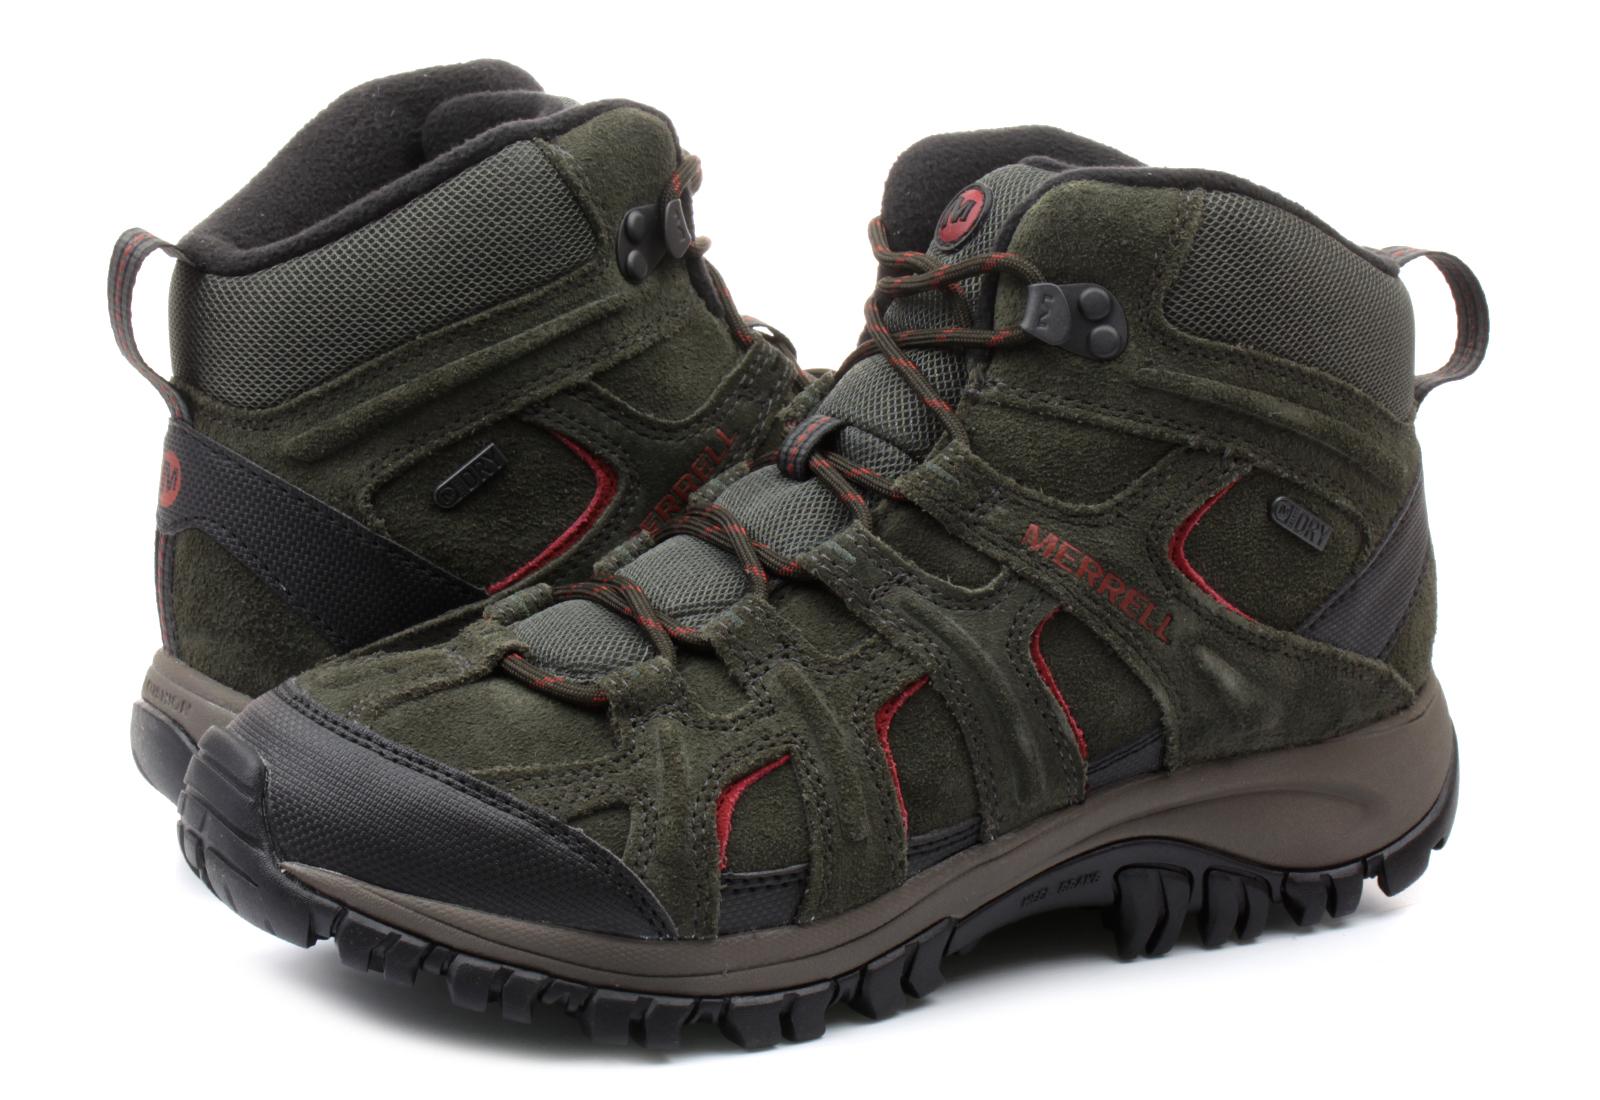 Merrell Bakancs - Phoenix 2 Mid Thermo - J09603-gry - Office Shoes ... 87e430882e